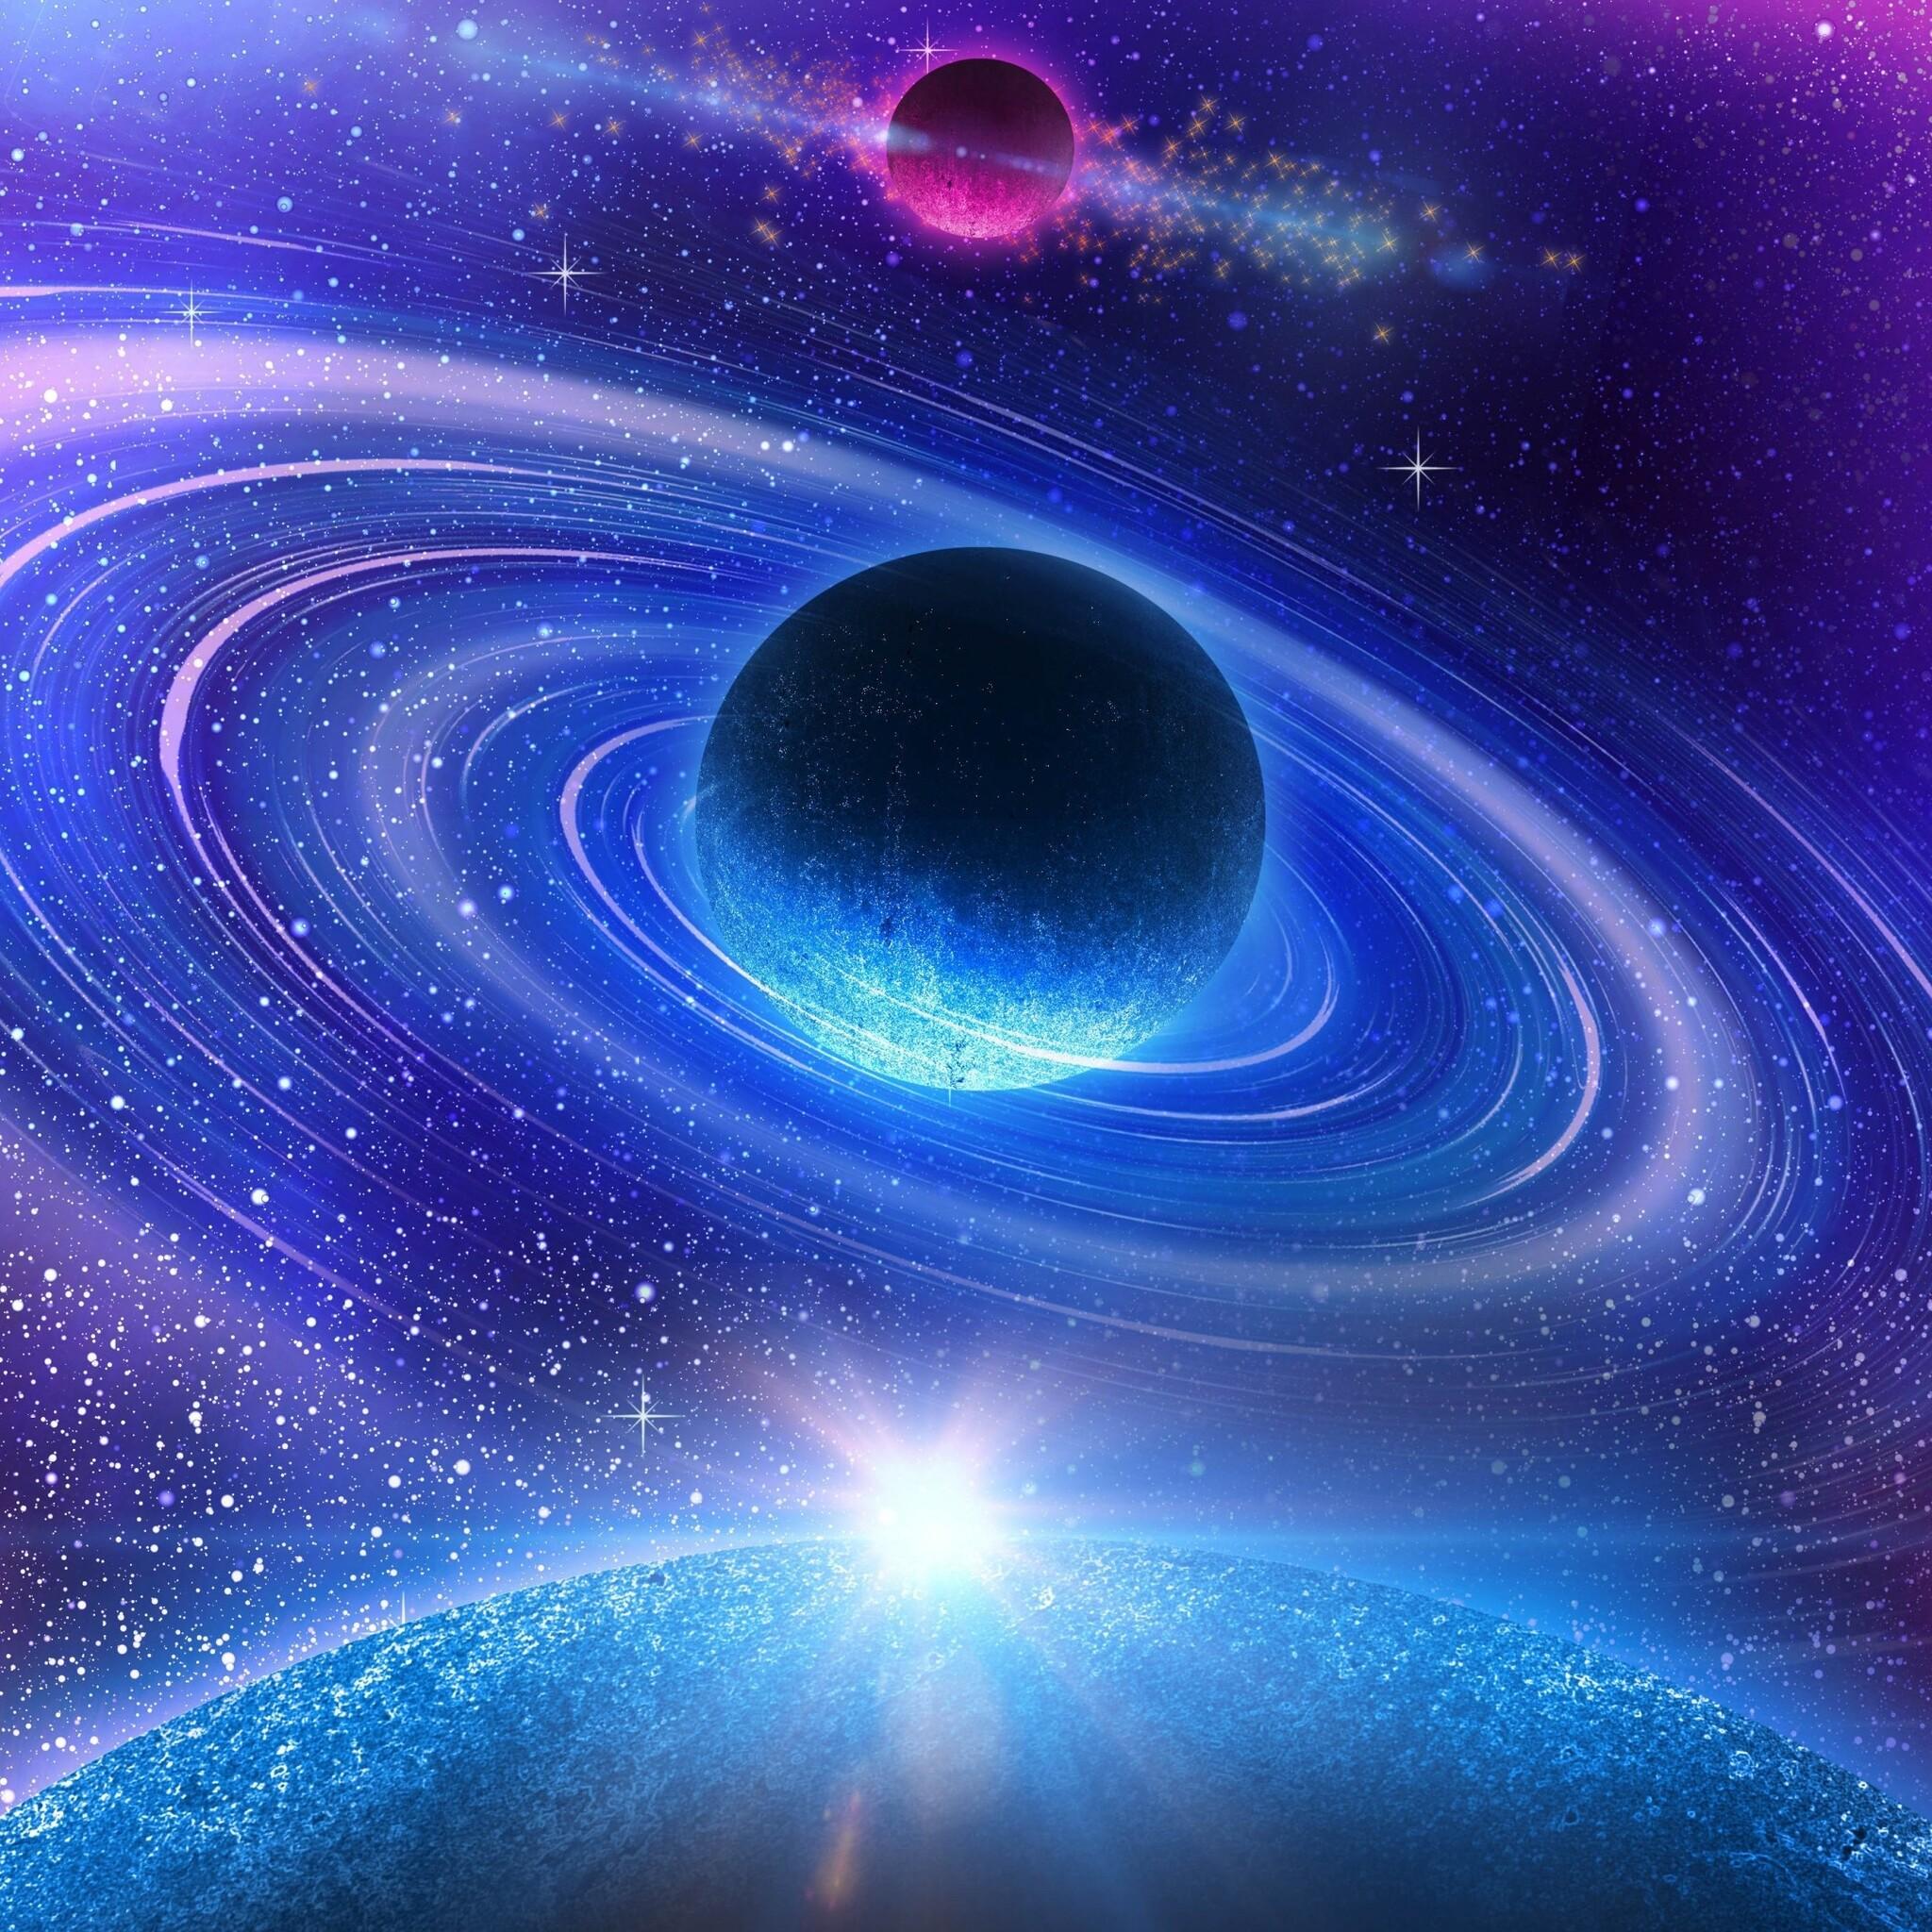 2048x2048 Solar System Colorful Digital Art 4k Ipad Air HD ...